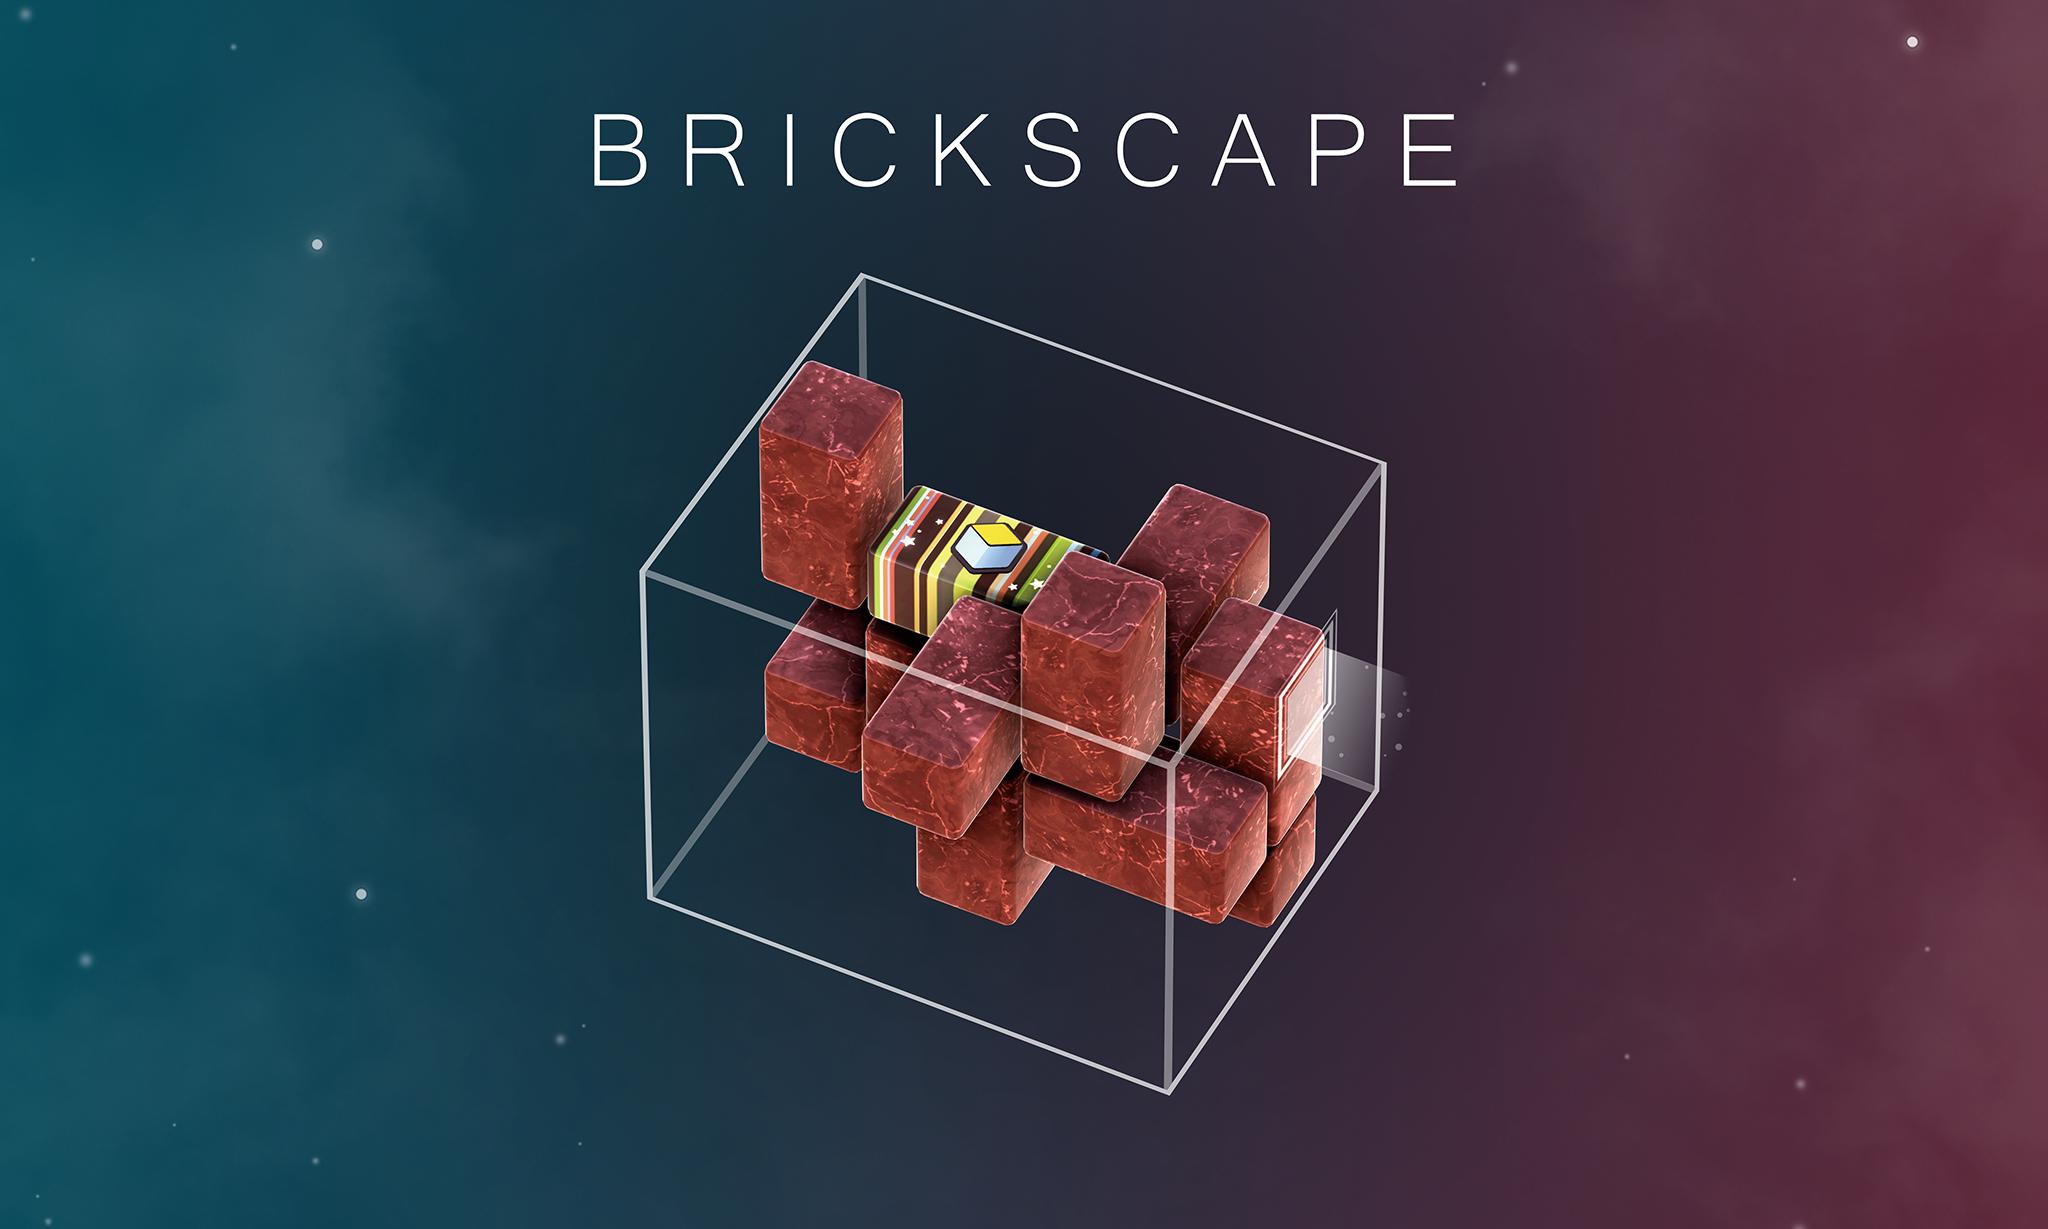 [MWU Korea '18] Brickscape / 5minlab